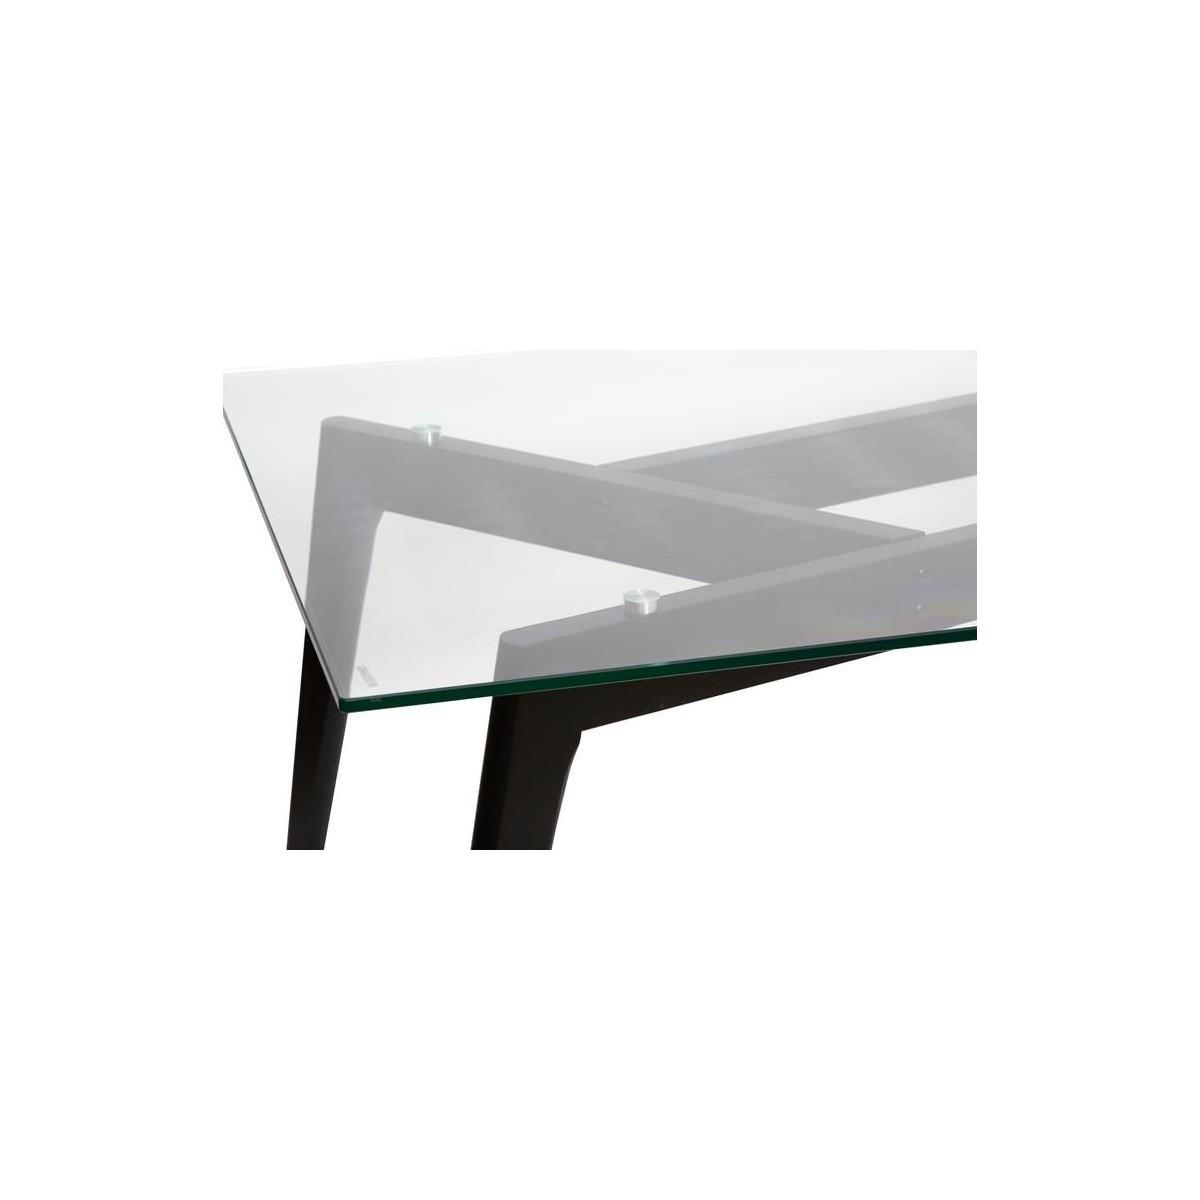 Mesa rectangular moderna cristal y madera de marckeric janis for Mesa cristal y madera